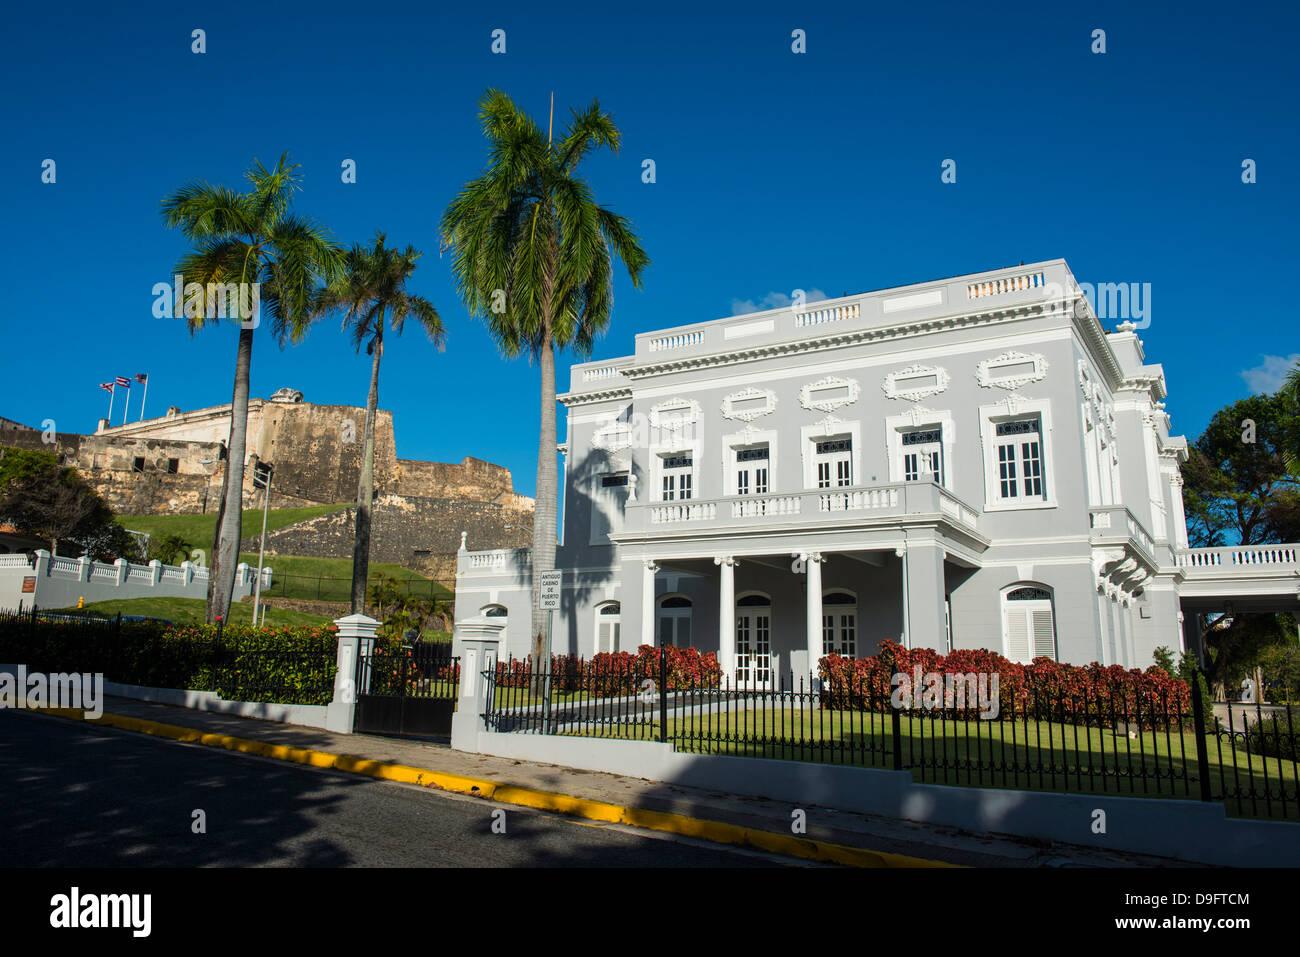 The casino of San Juan, Puerto Rico, West Indies, Caribbean - Stock Image